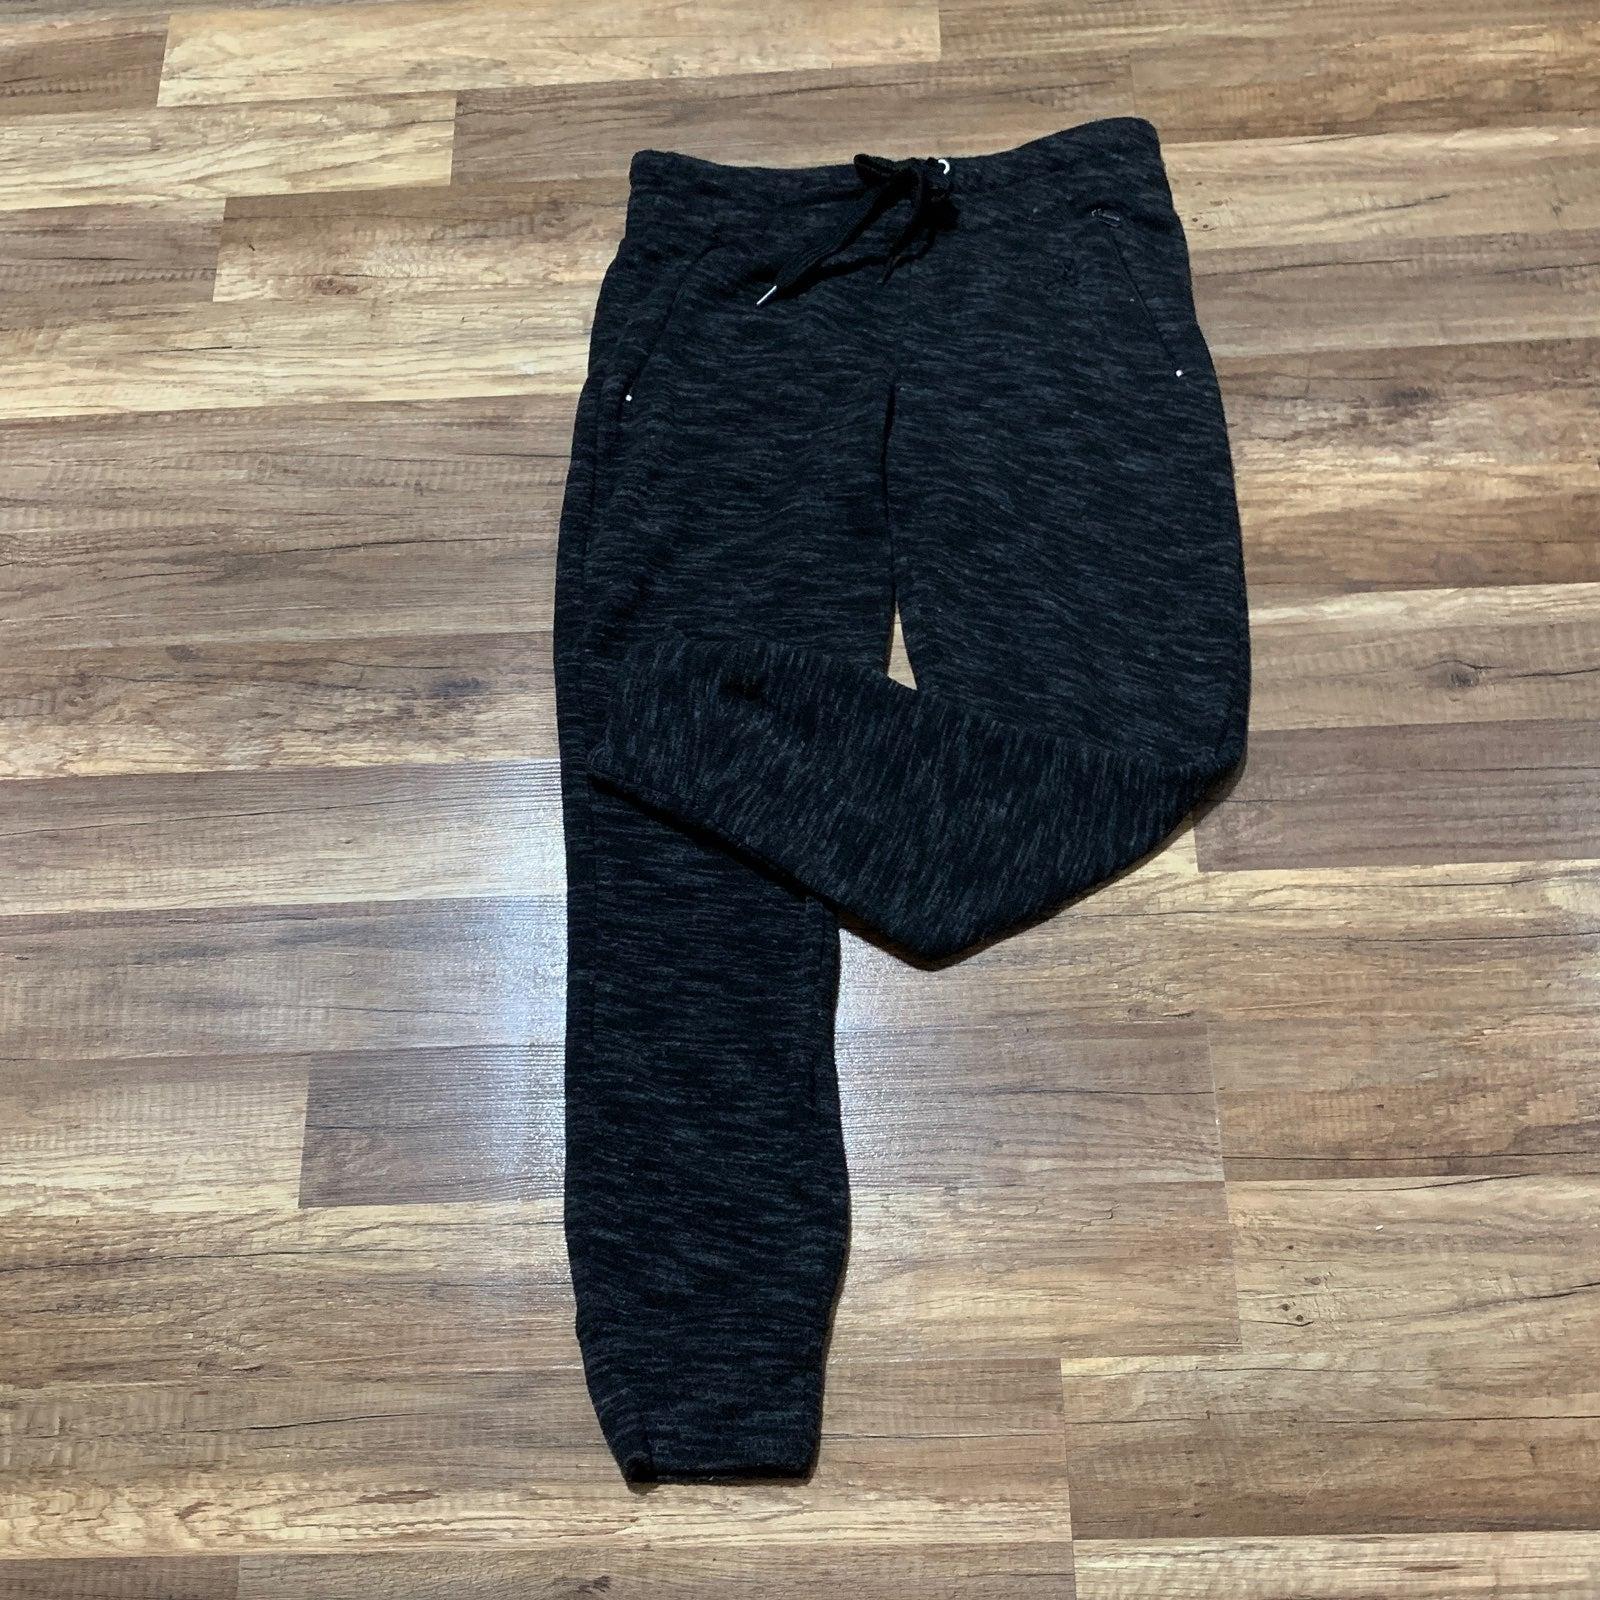 Sweatpants B.H. POLO CLUB dark grey L